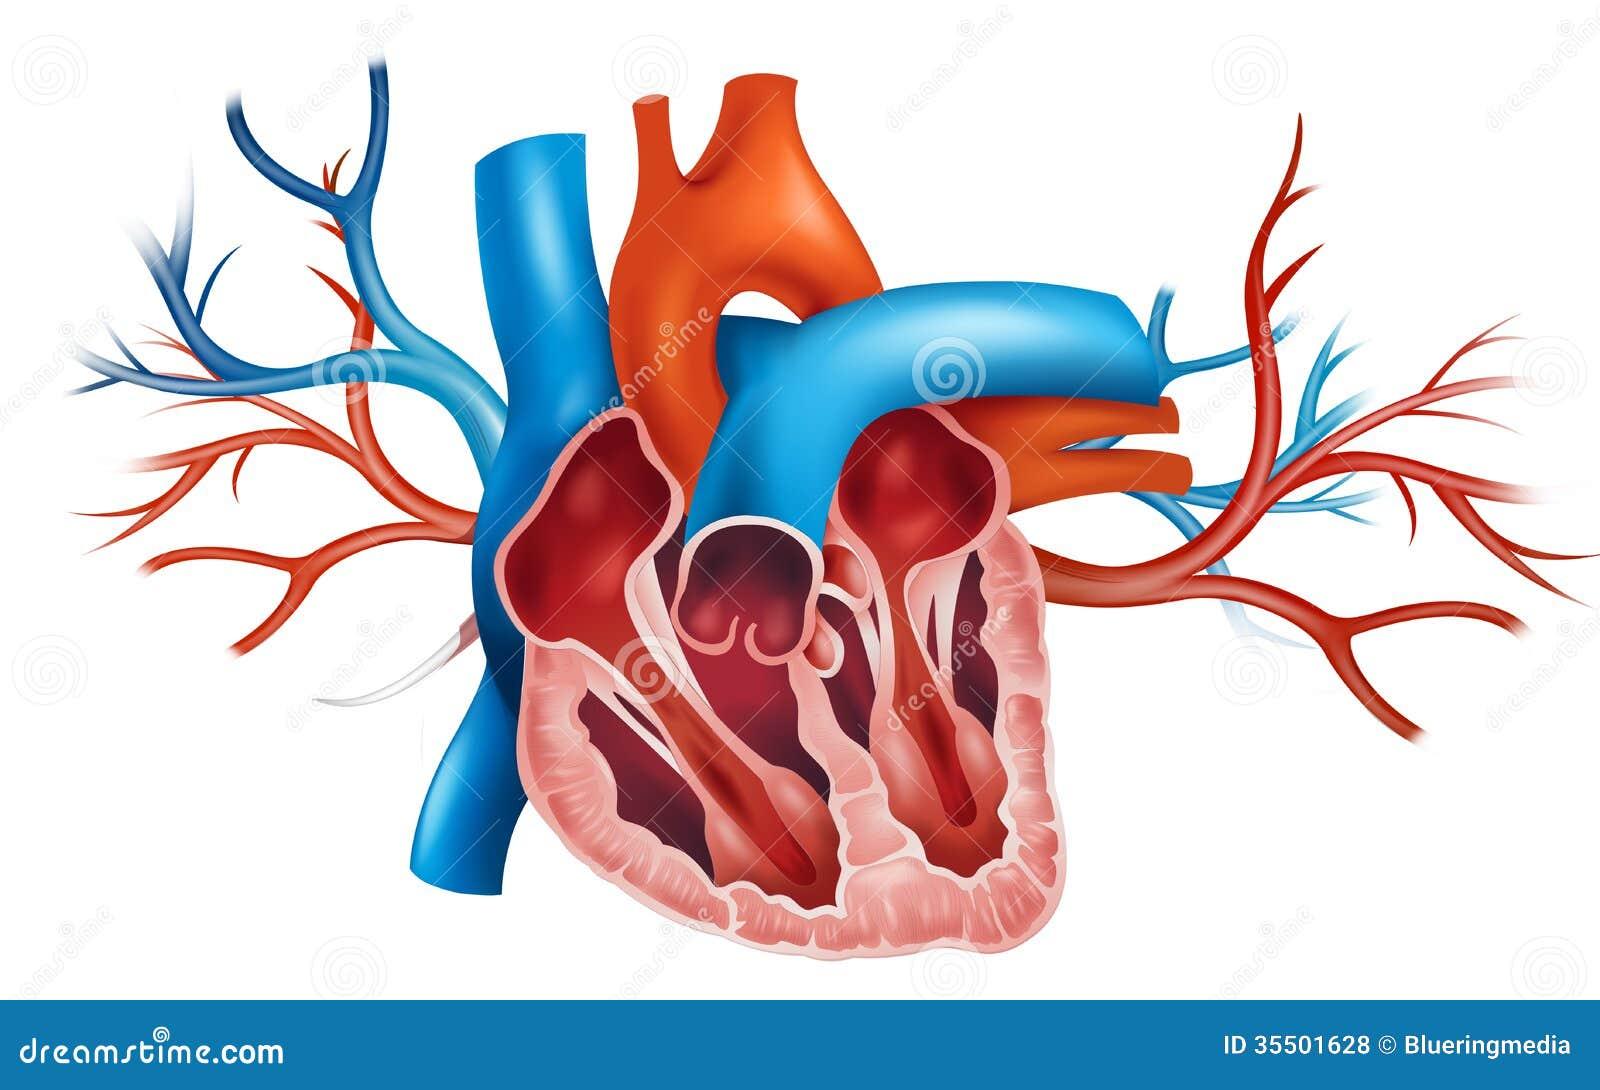 Human Heart Royalty Free Stock Photos - Image: 35501628